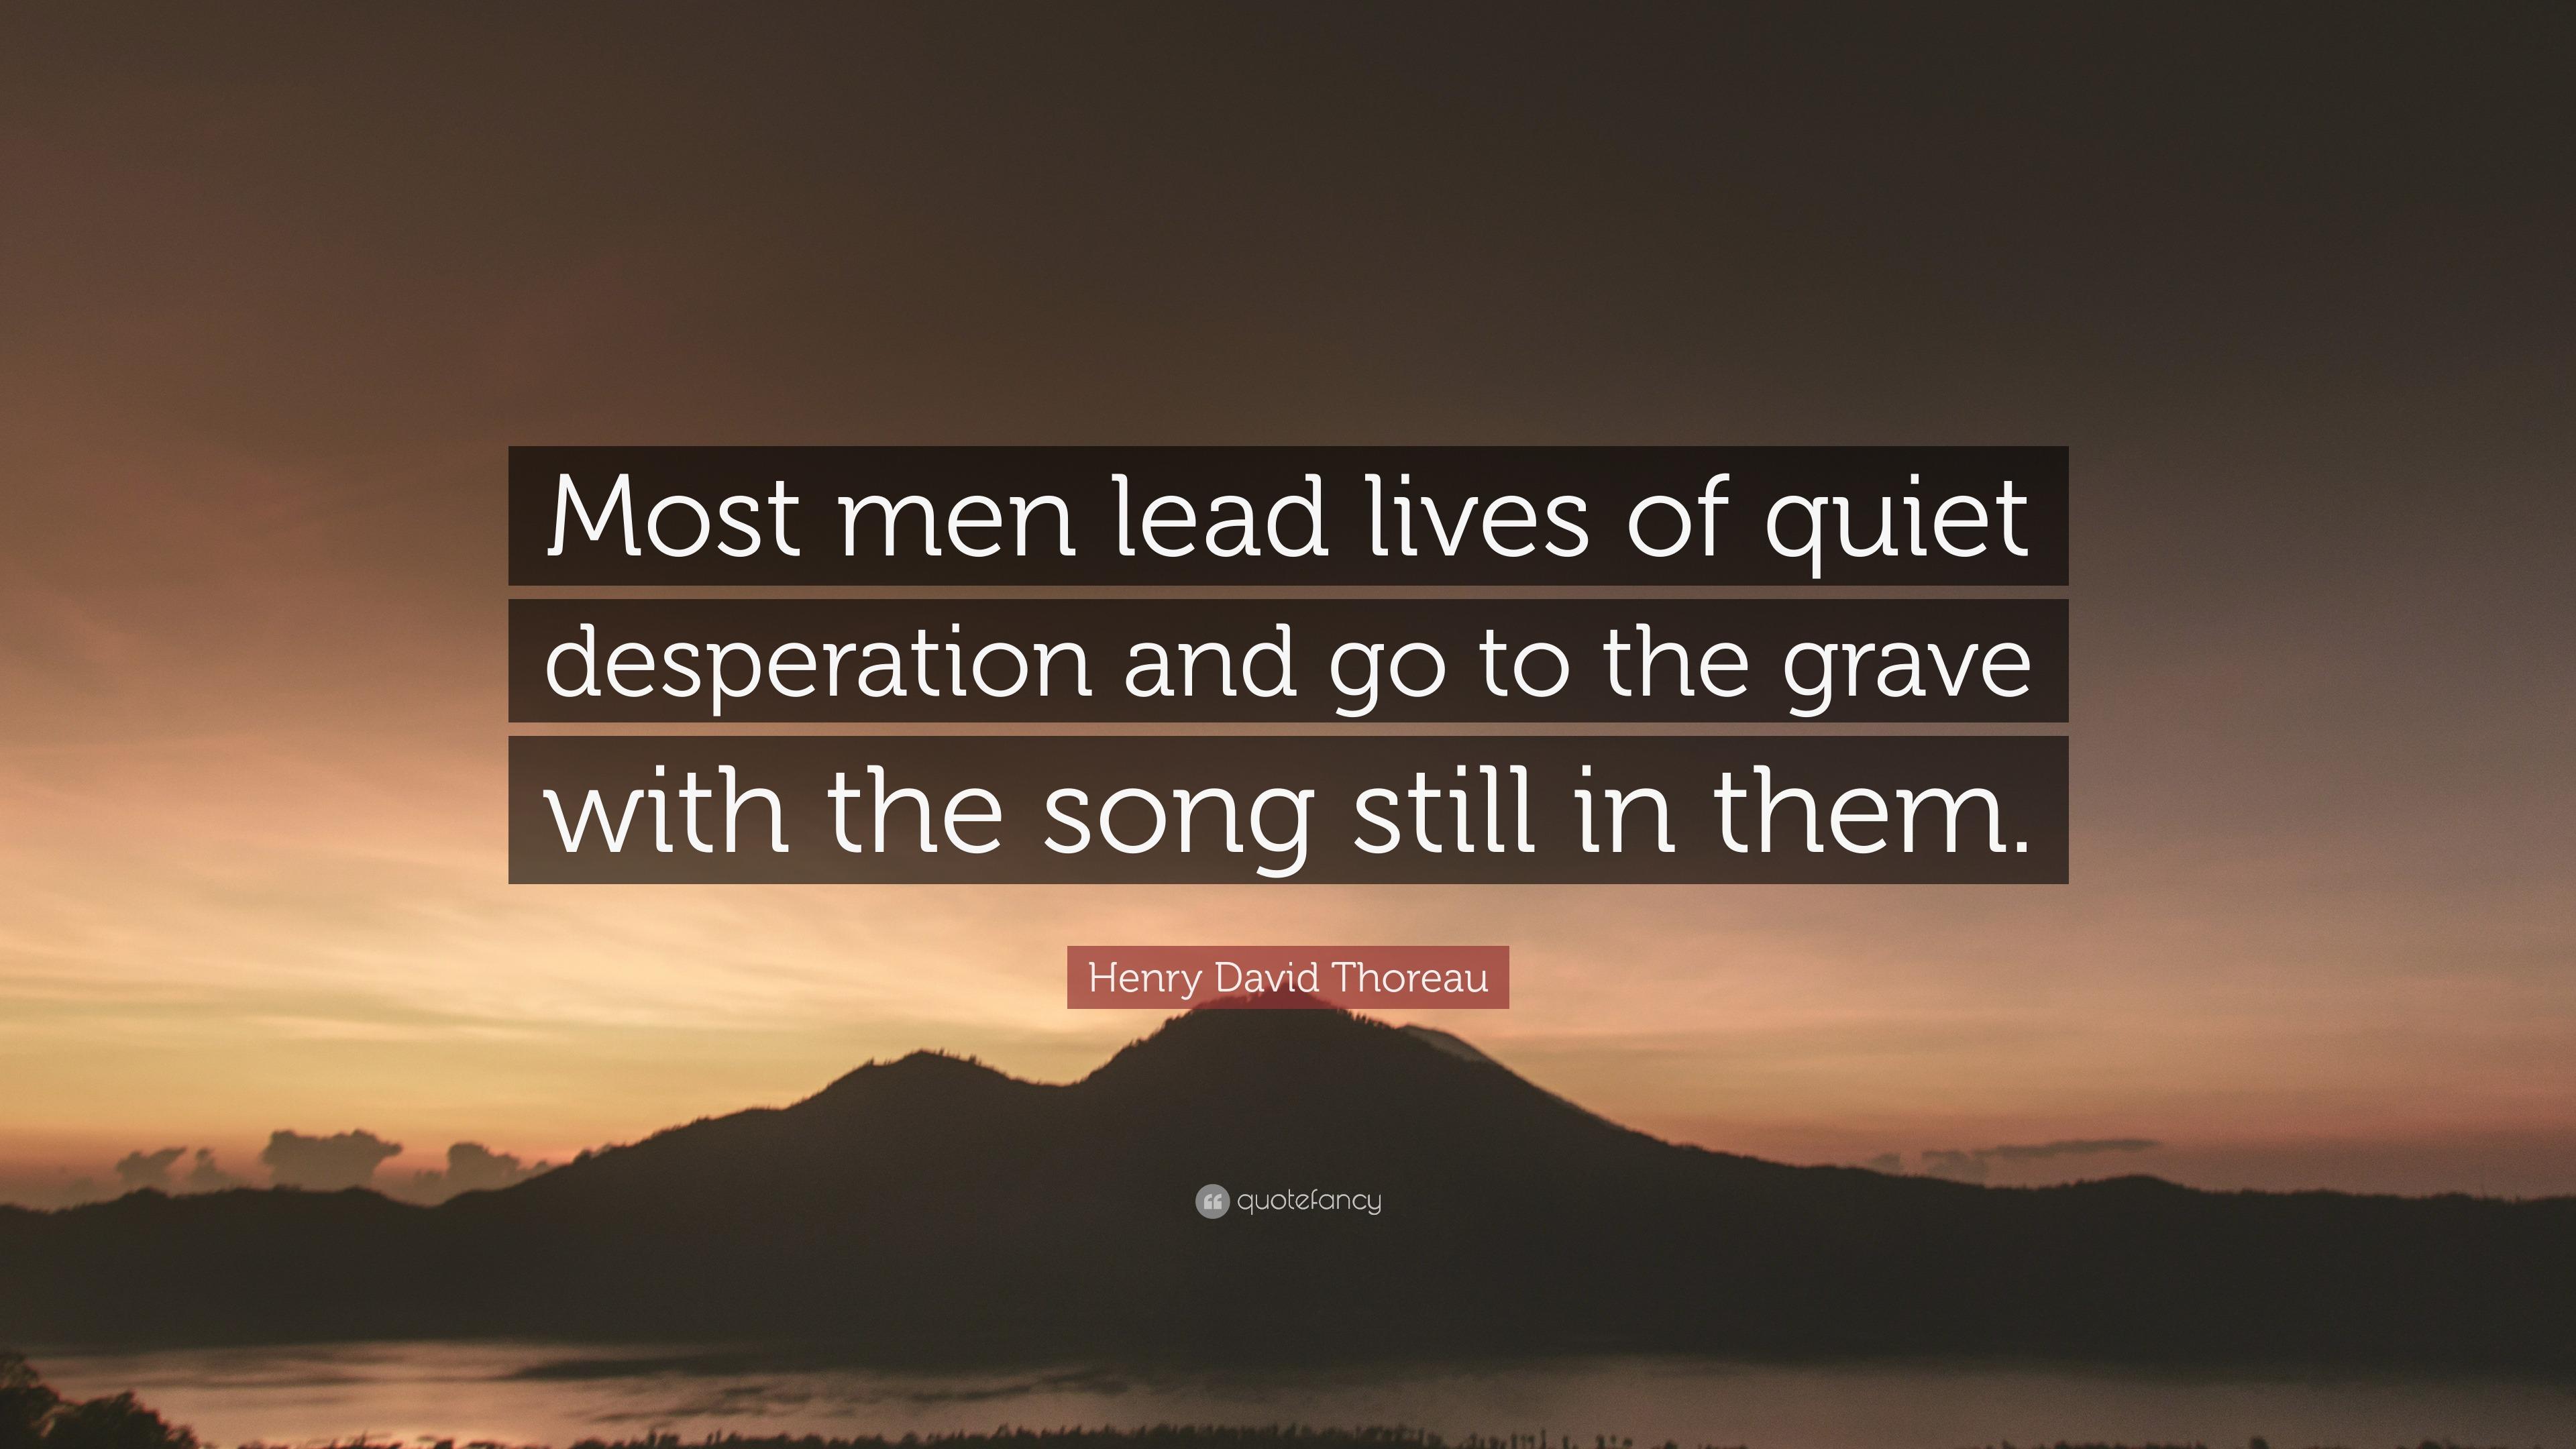 we all live lives of quiet desperation